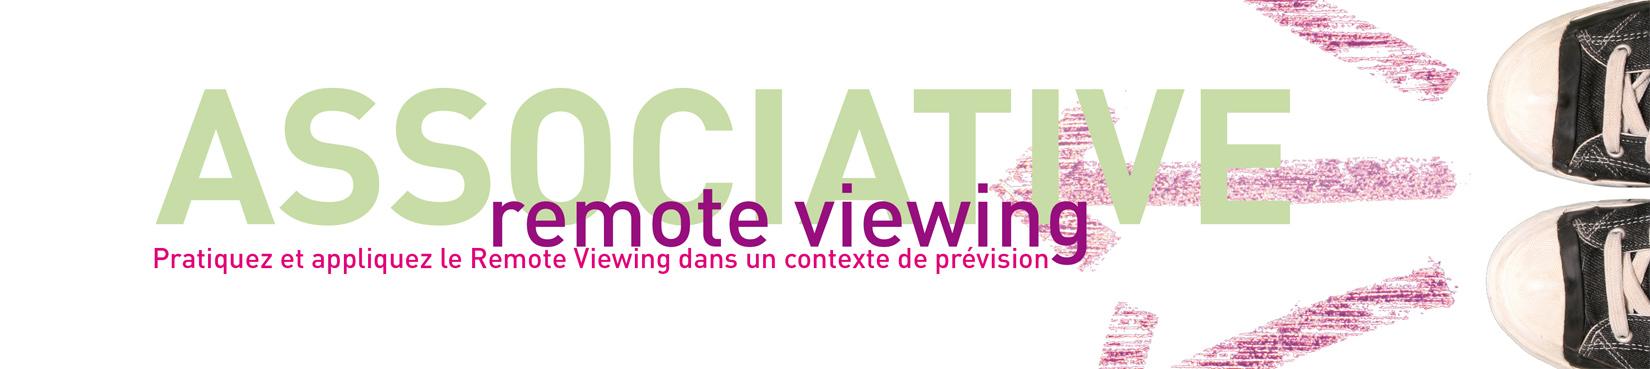 Associative remote viewing forex